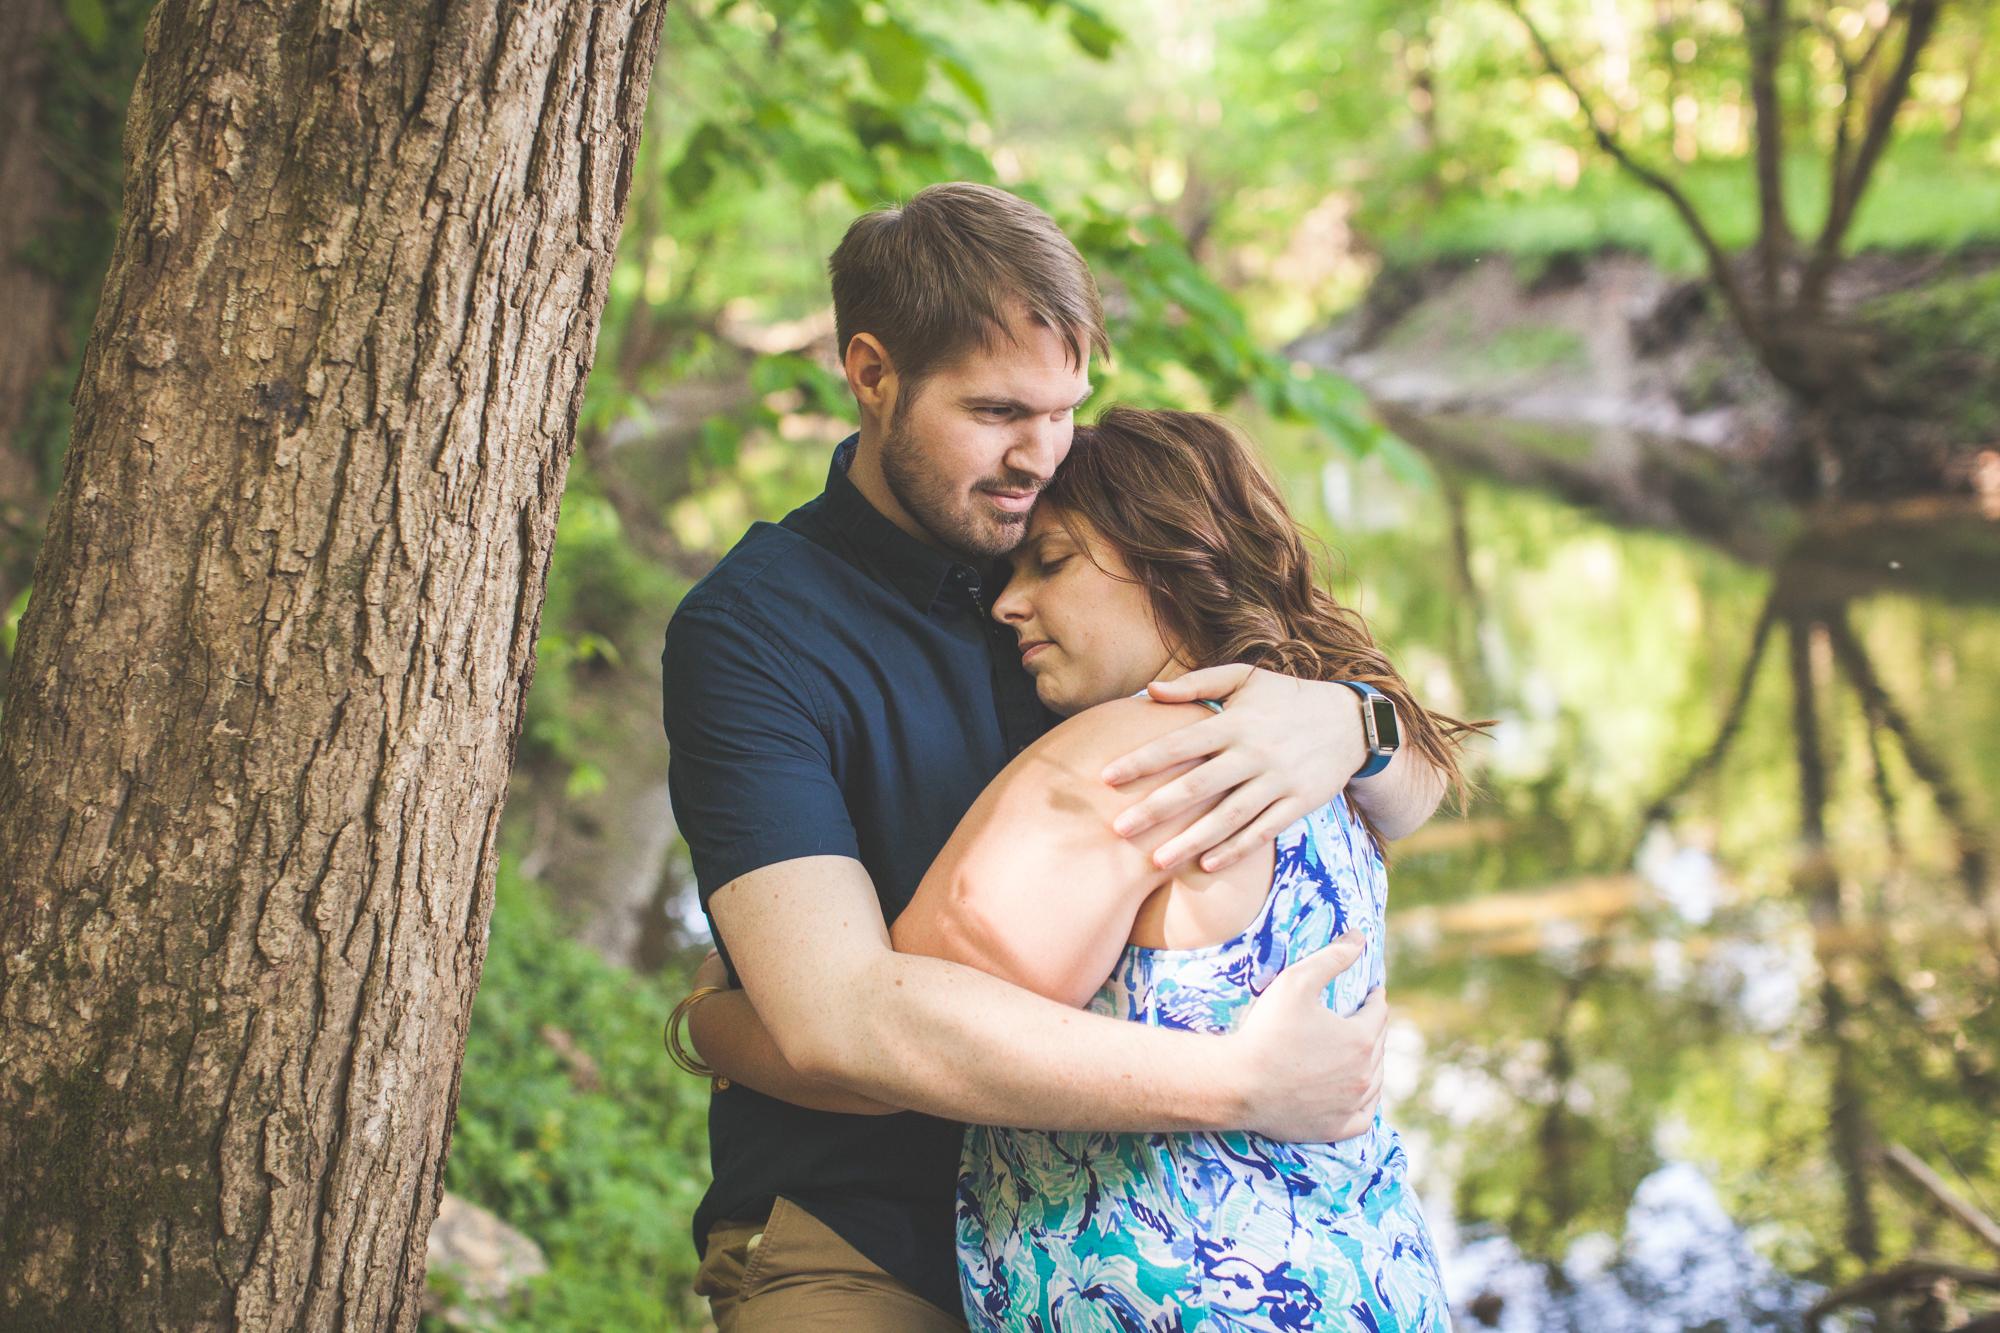 20180507-BridgetAdam-Engagement-blog-8.jpg